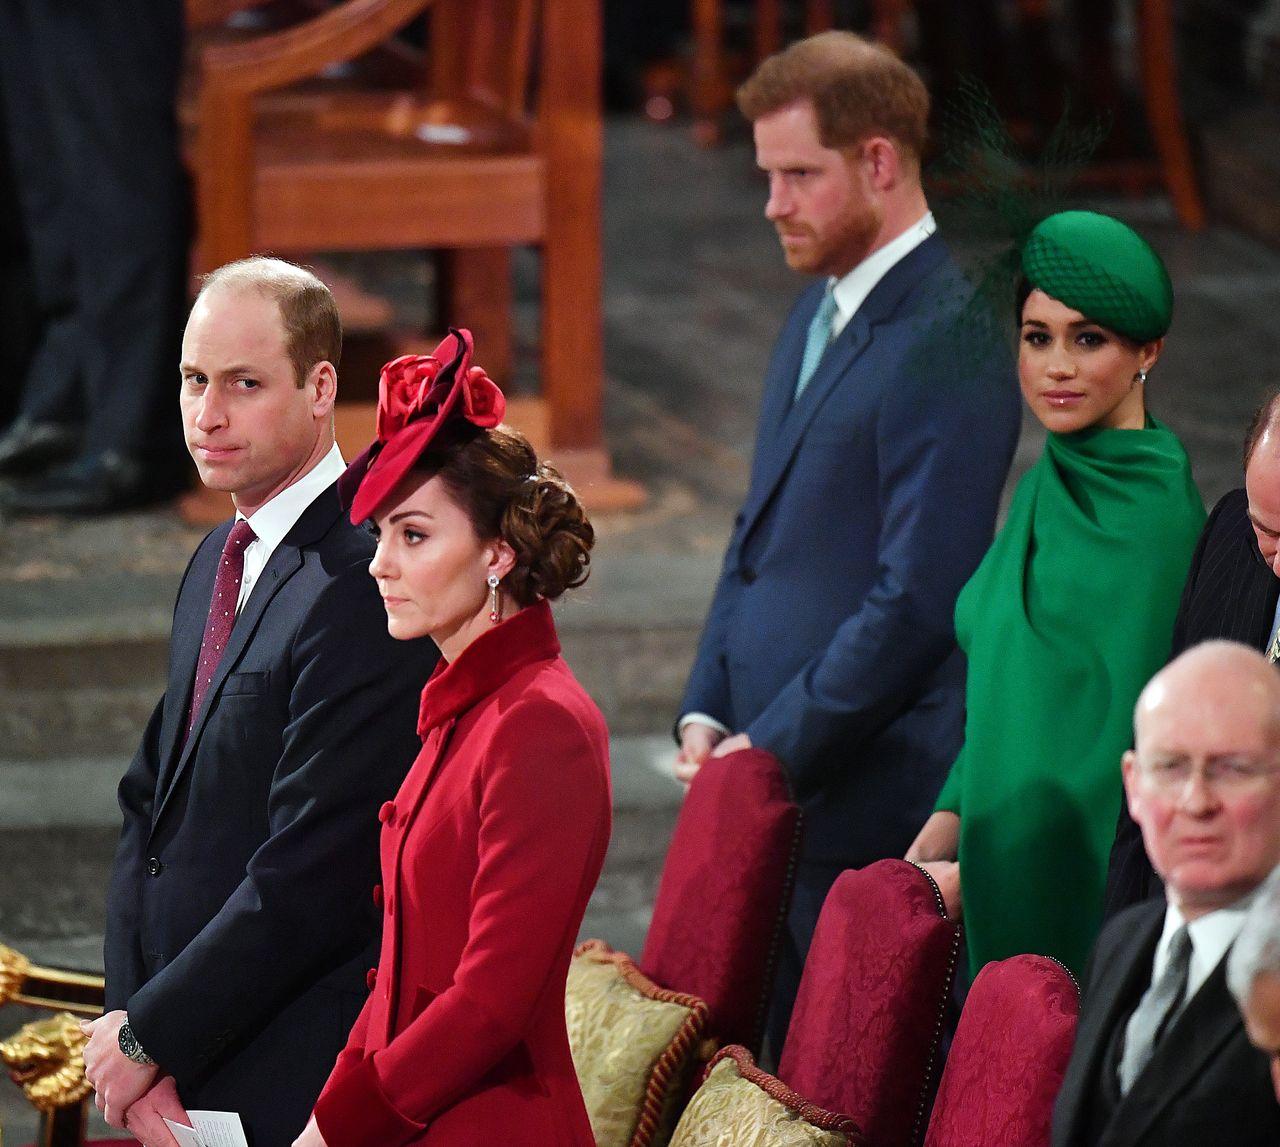 Meghan Markle, Książę Harry, Księżna Kate i Książę, William